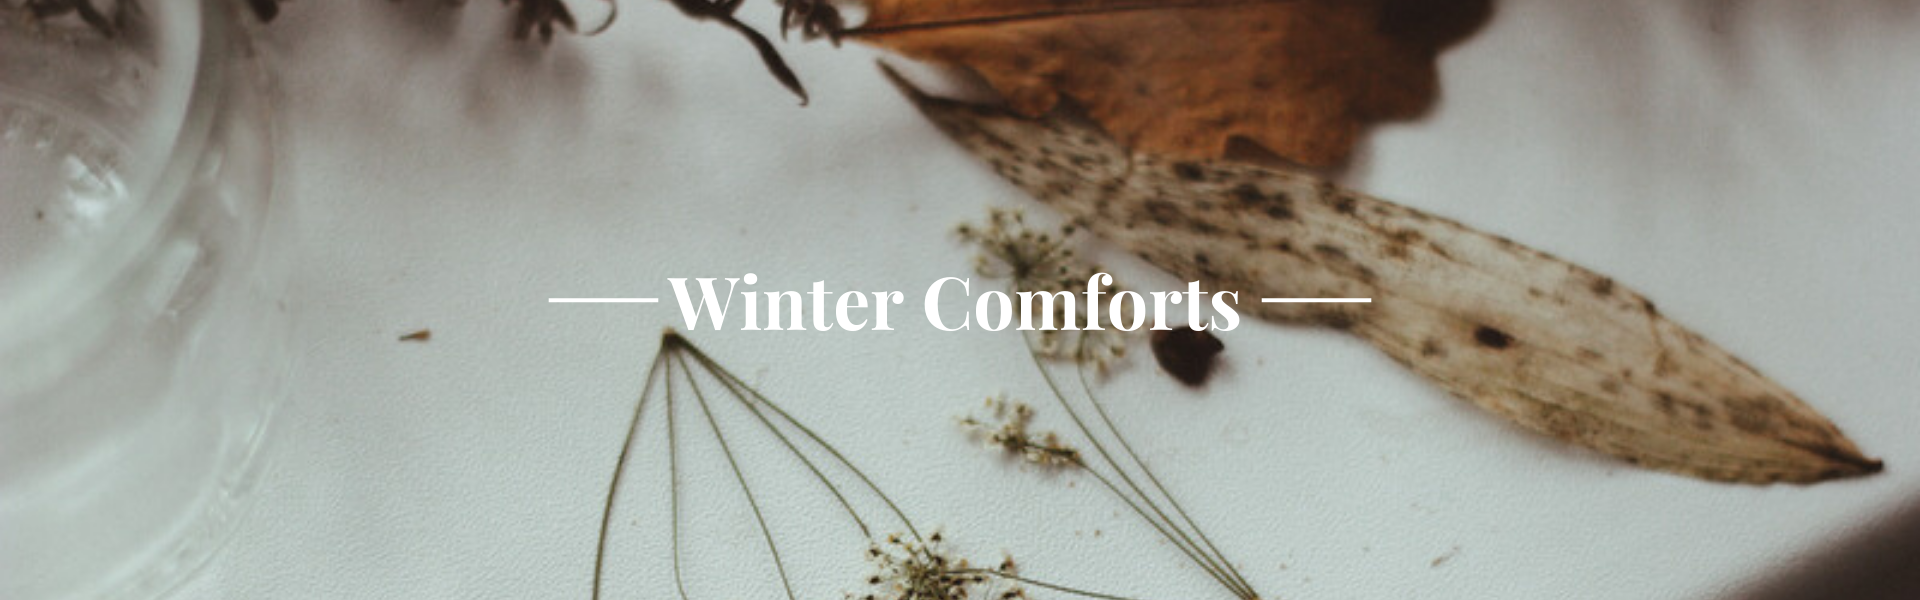 Winter comforts